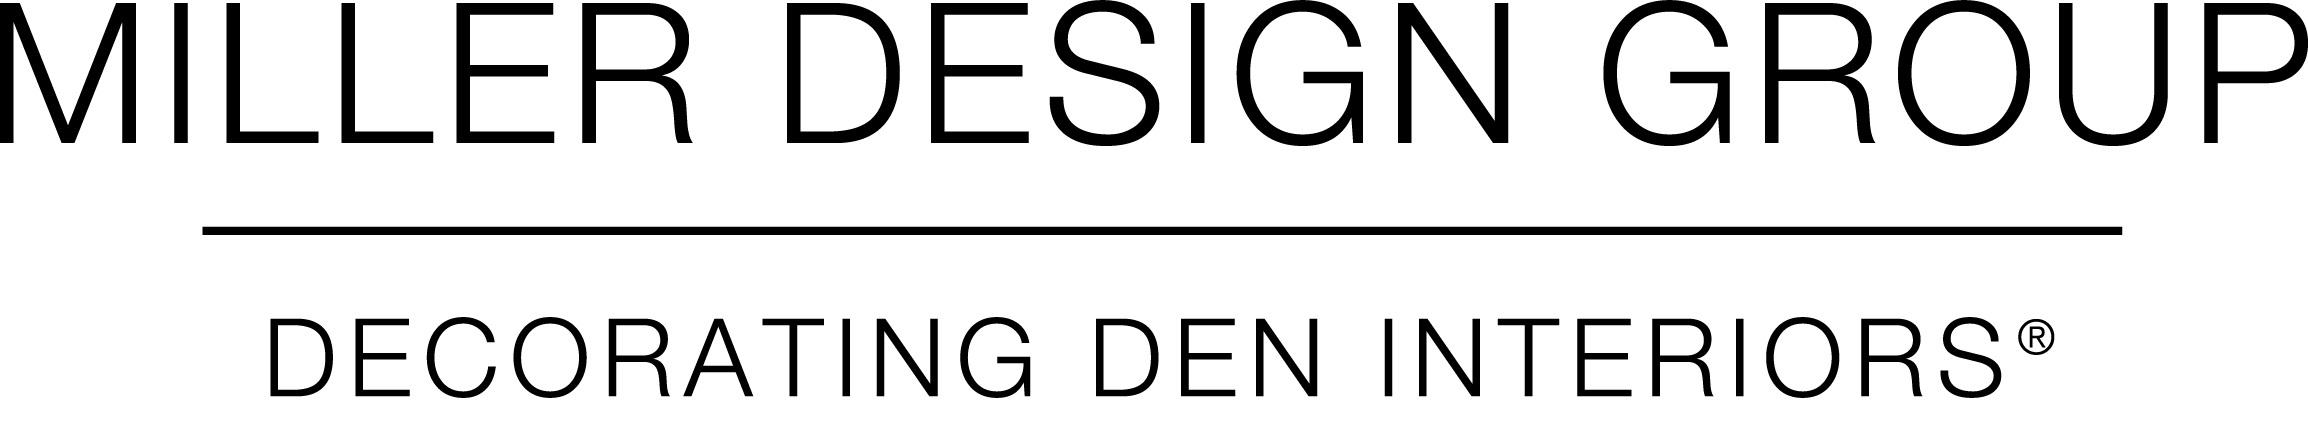 Miller Design Group - Decorating Den Interiors